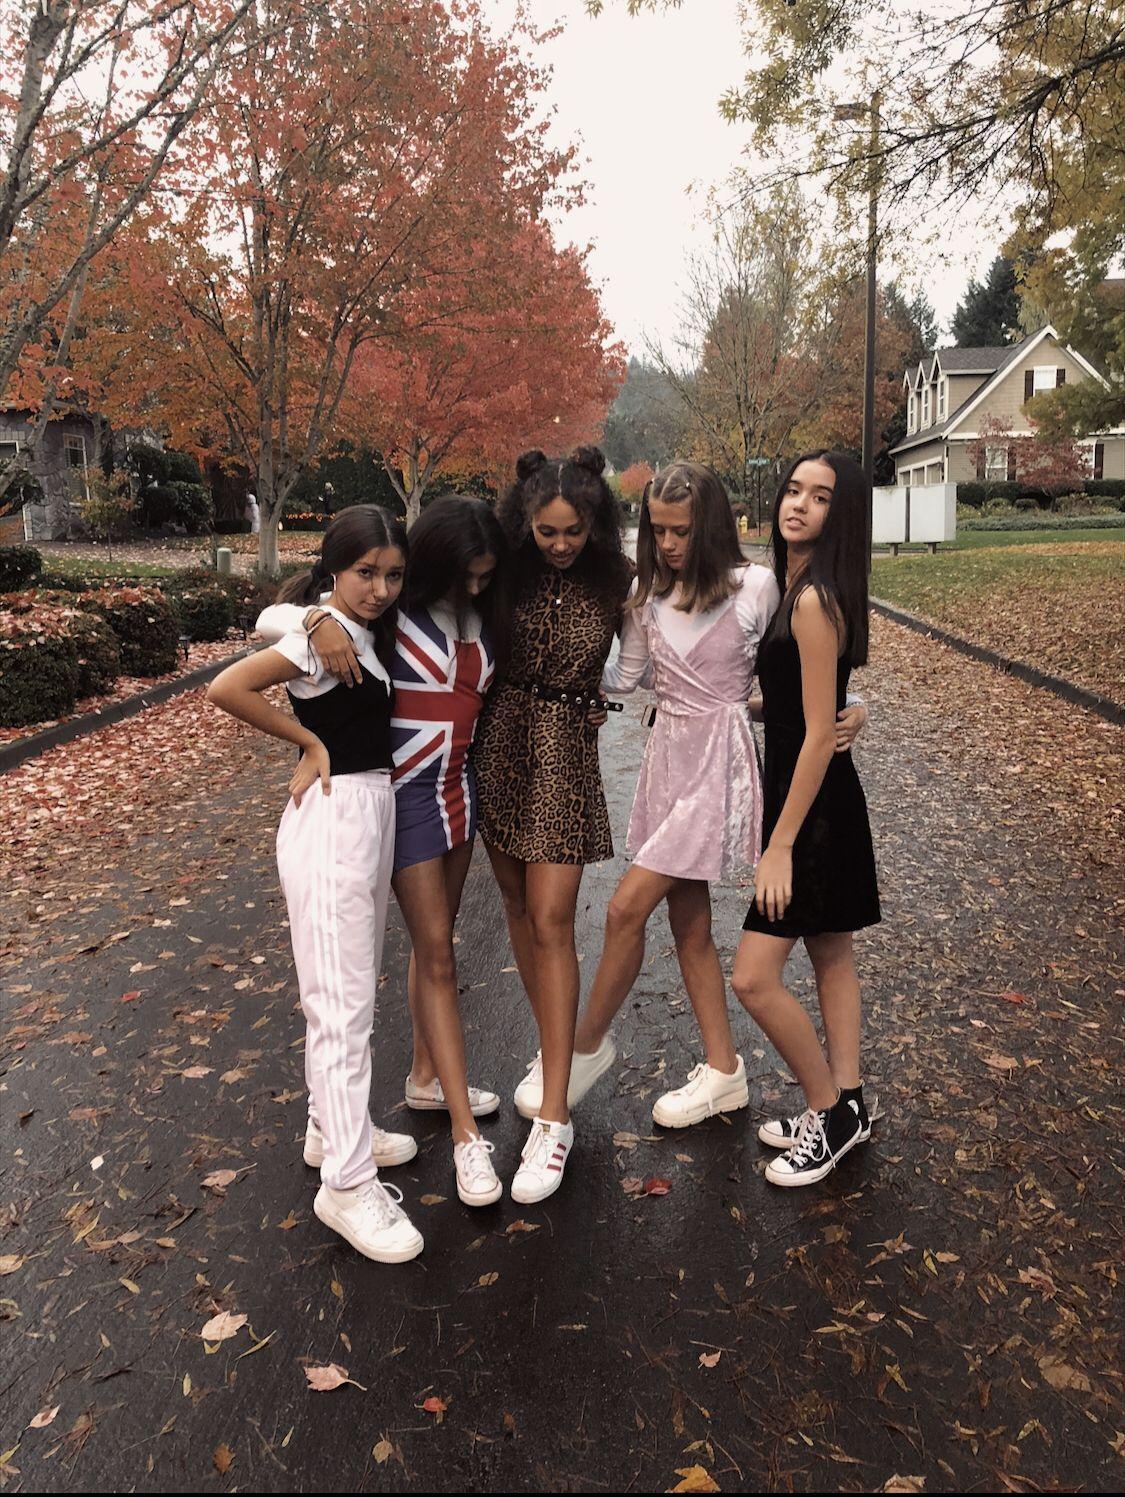 spice girls???? #grouphalloweencostumes